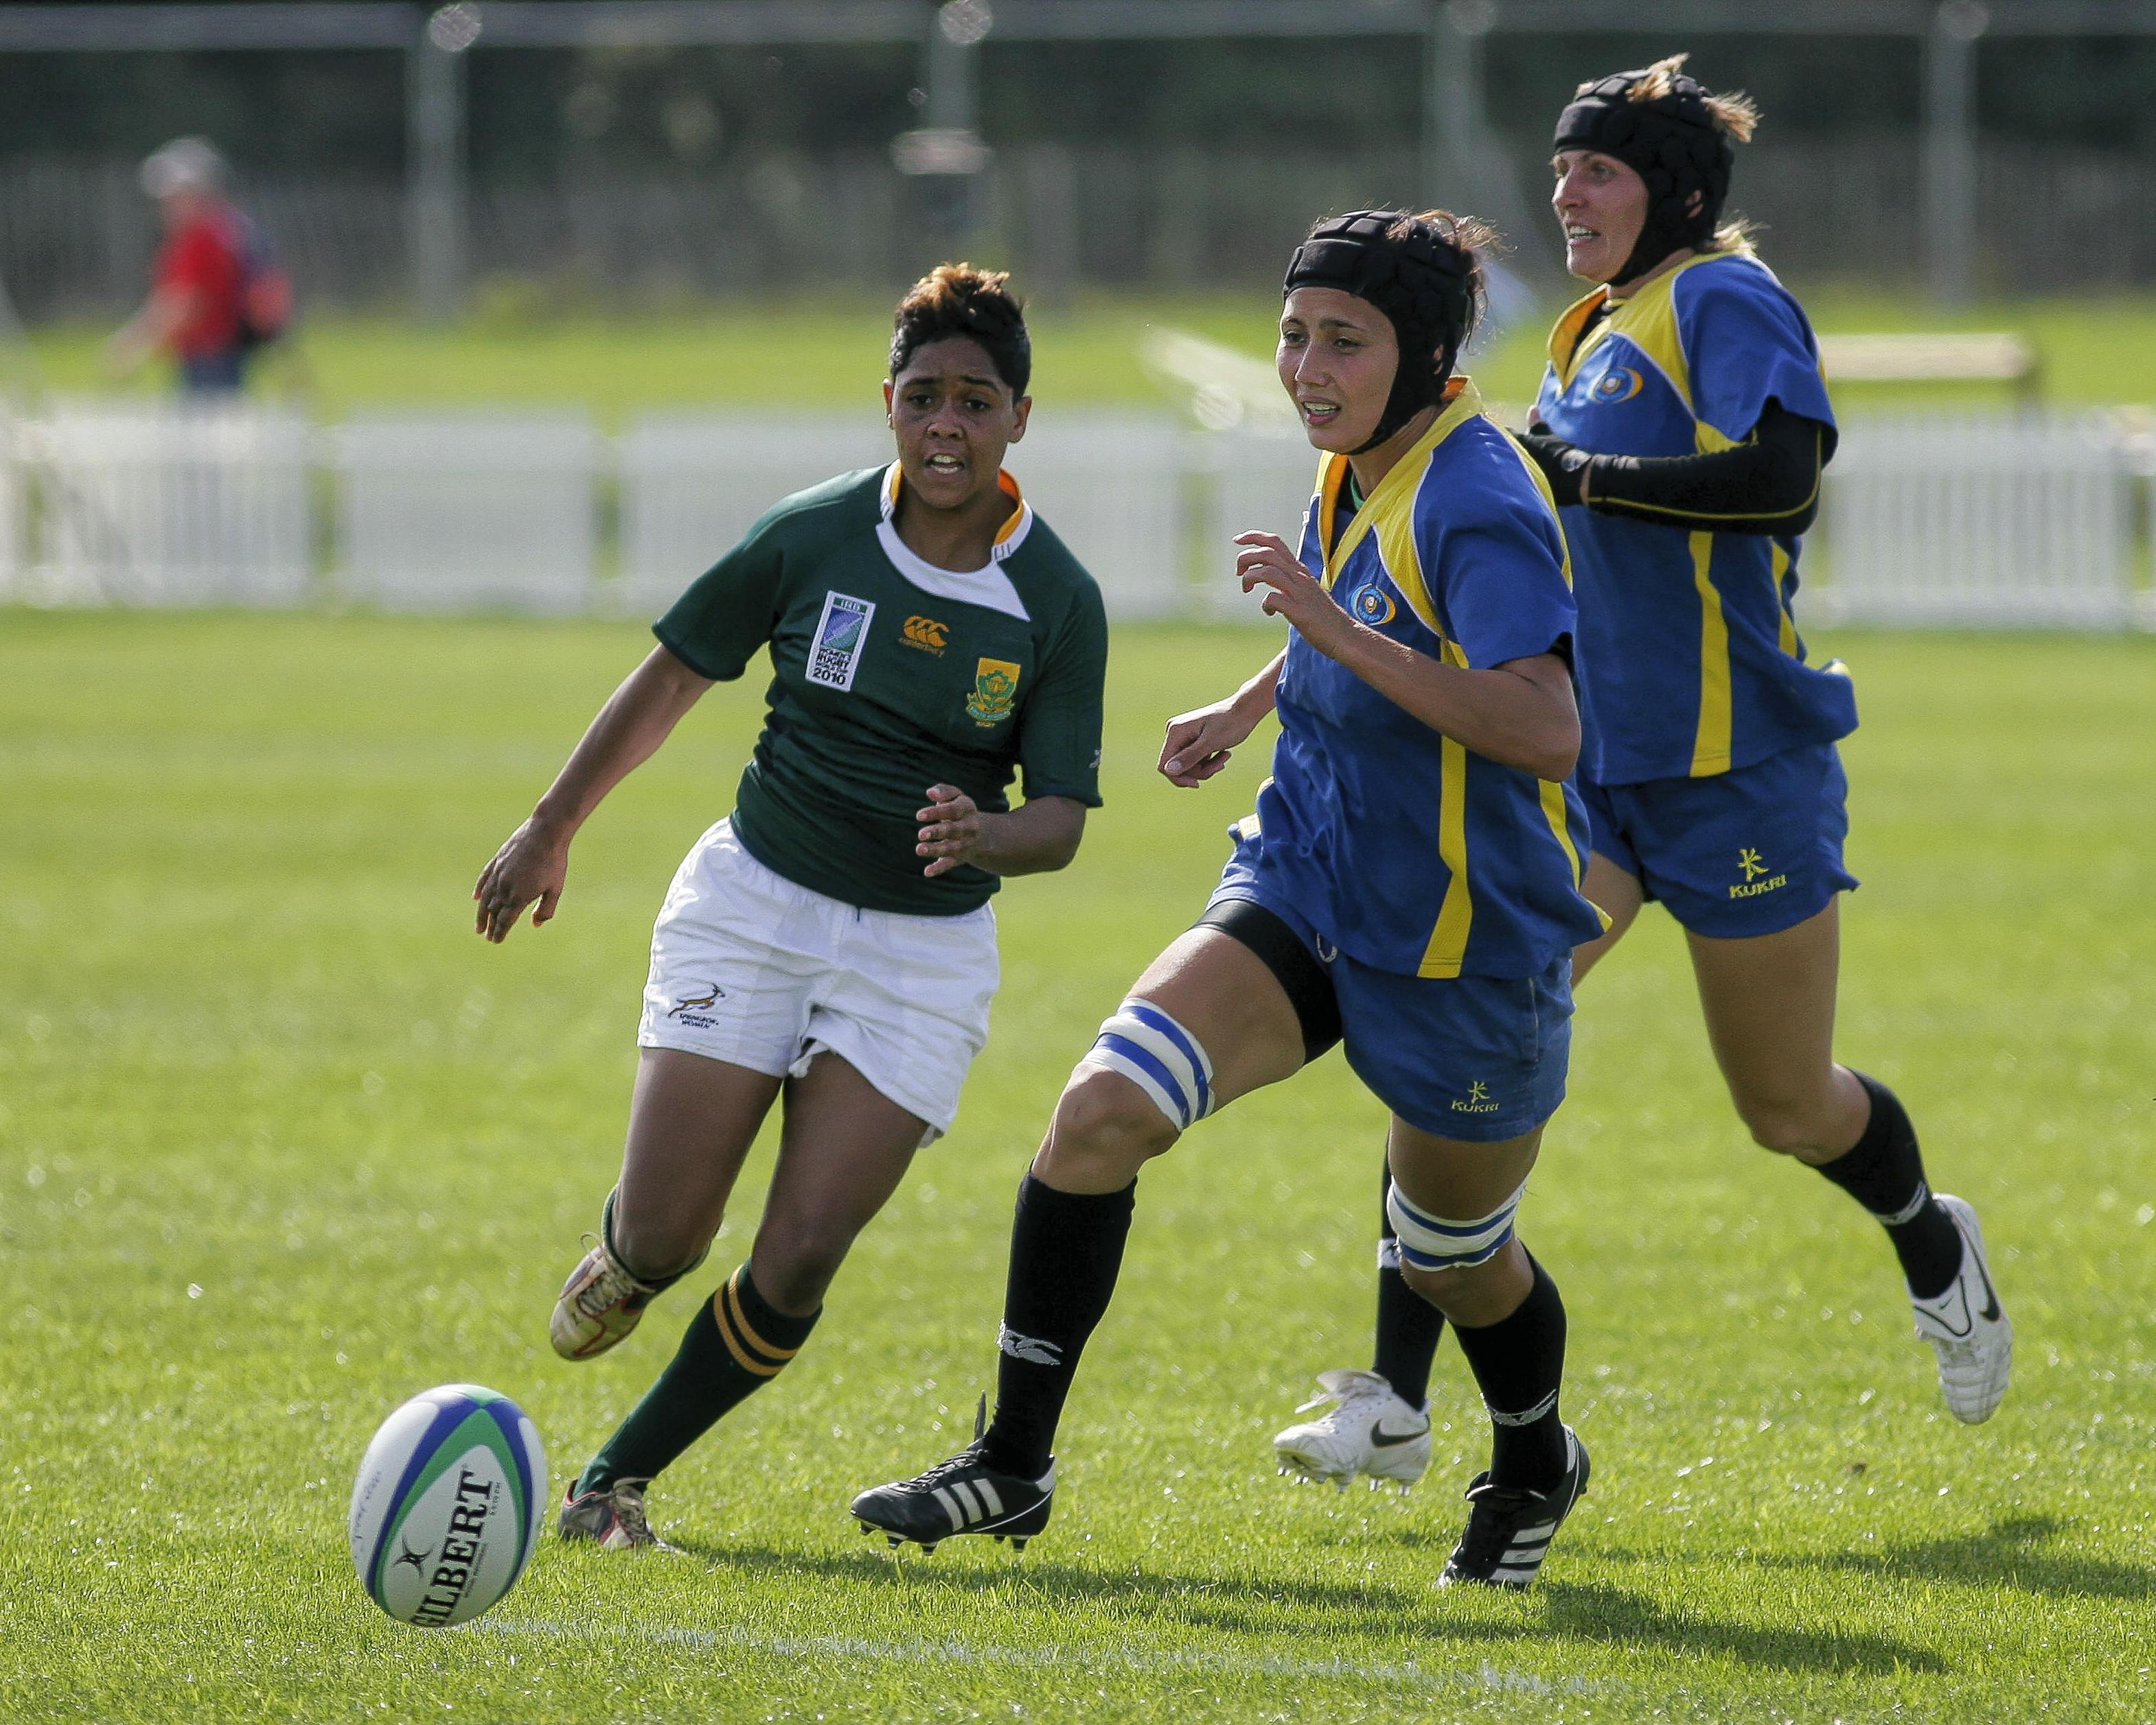 Springbok Women target place at WRWC 2021